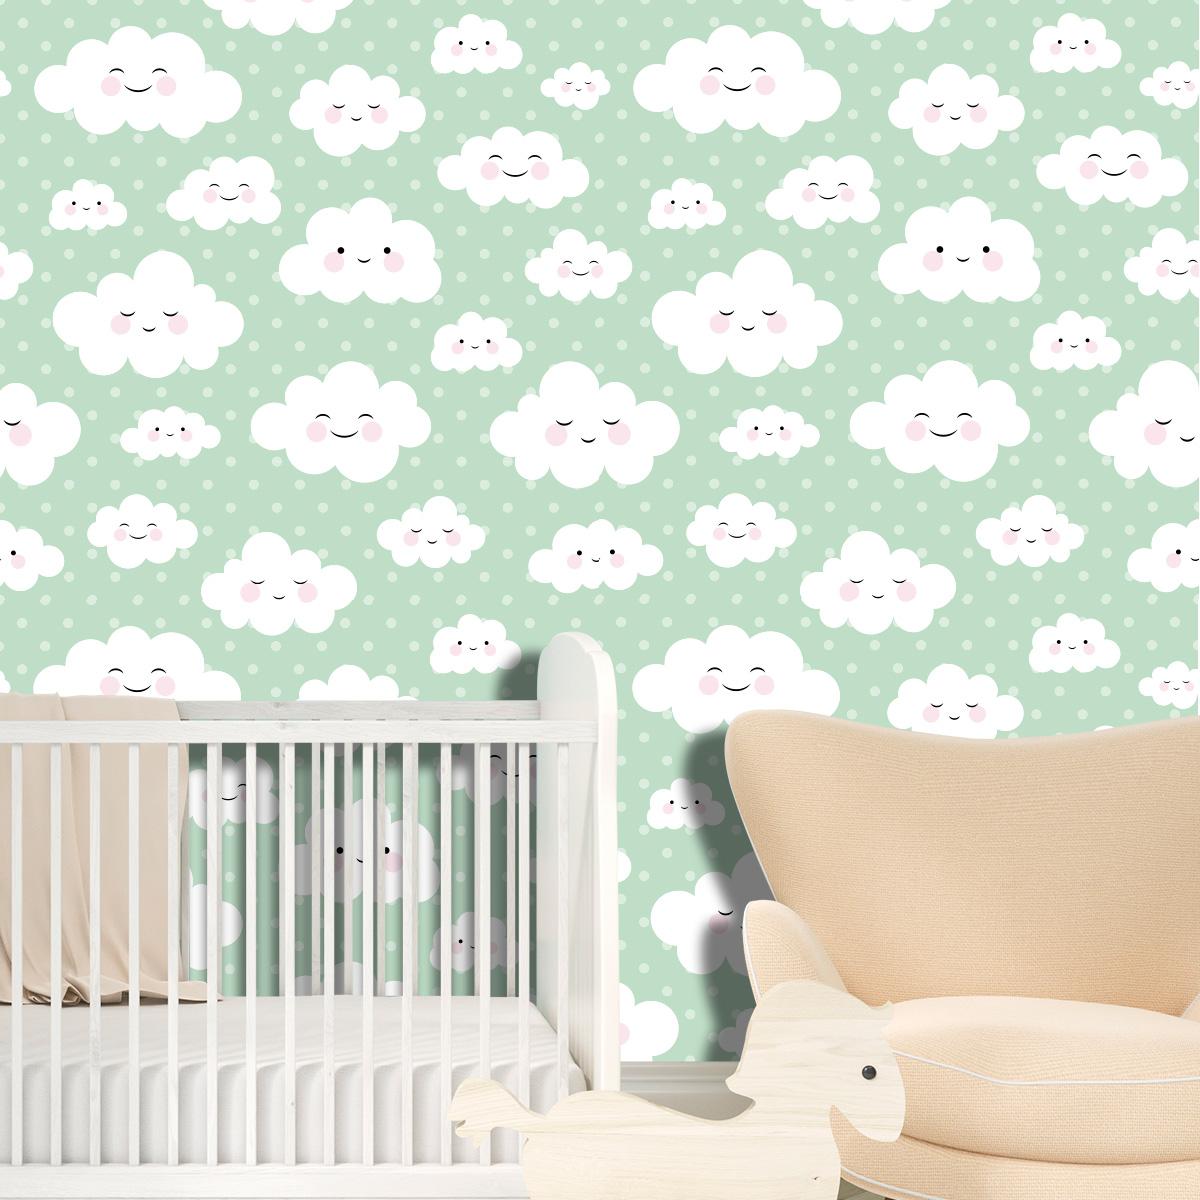 Papel de Parede Nuvens Poa Bebê Adesivo